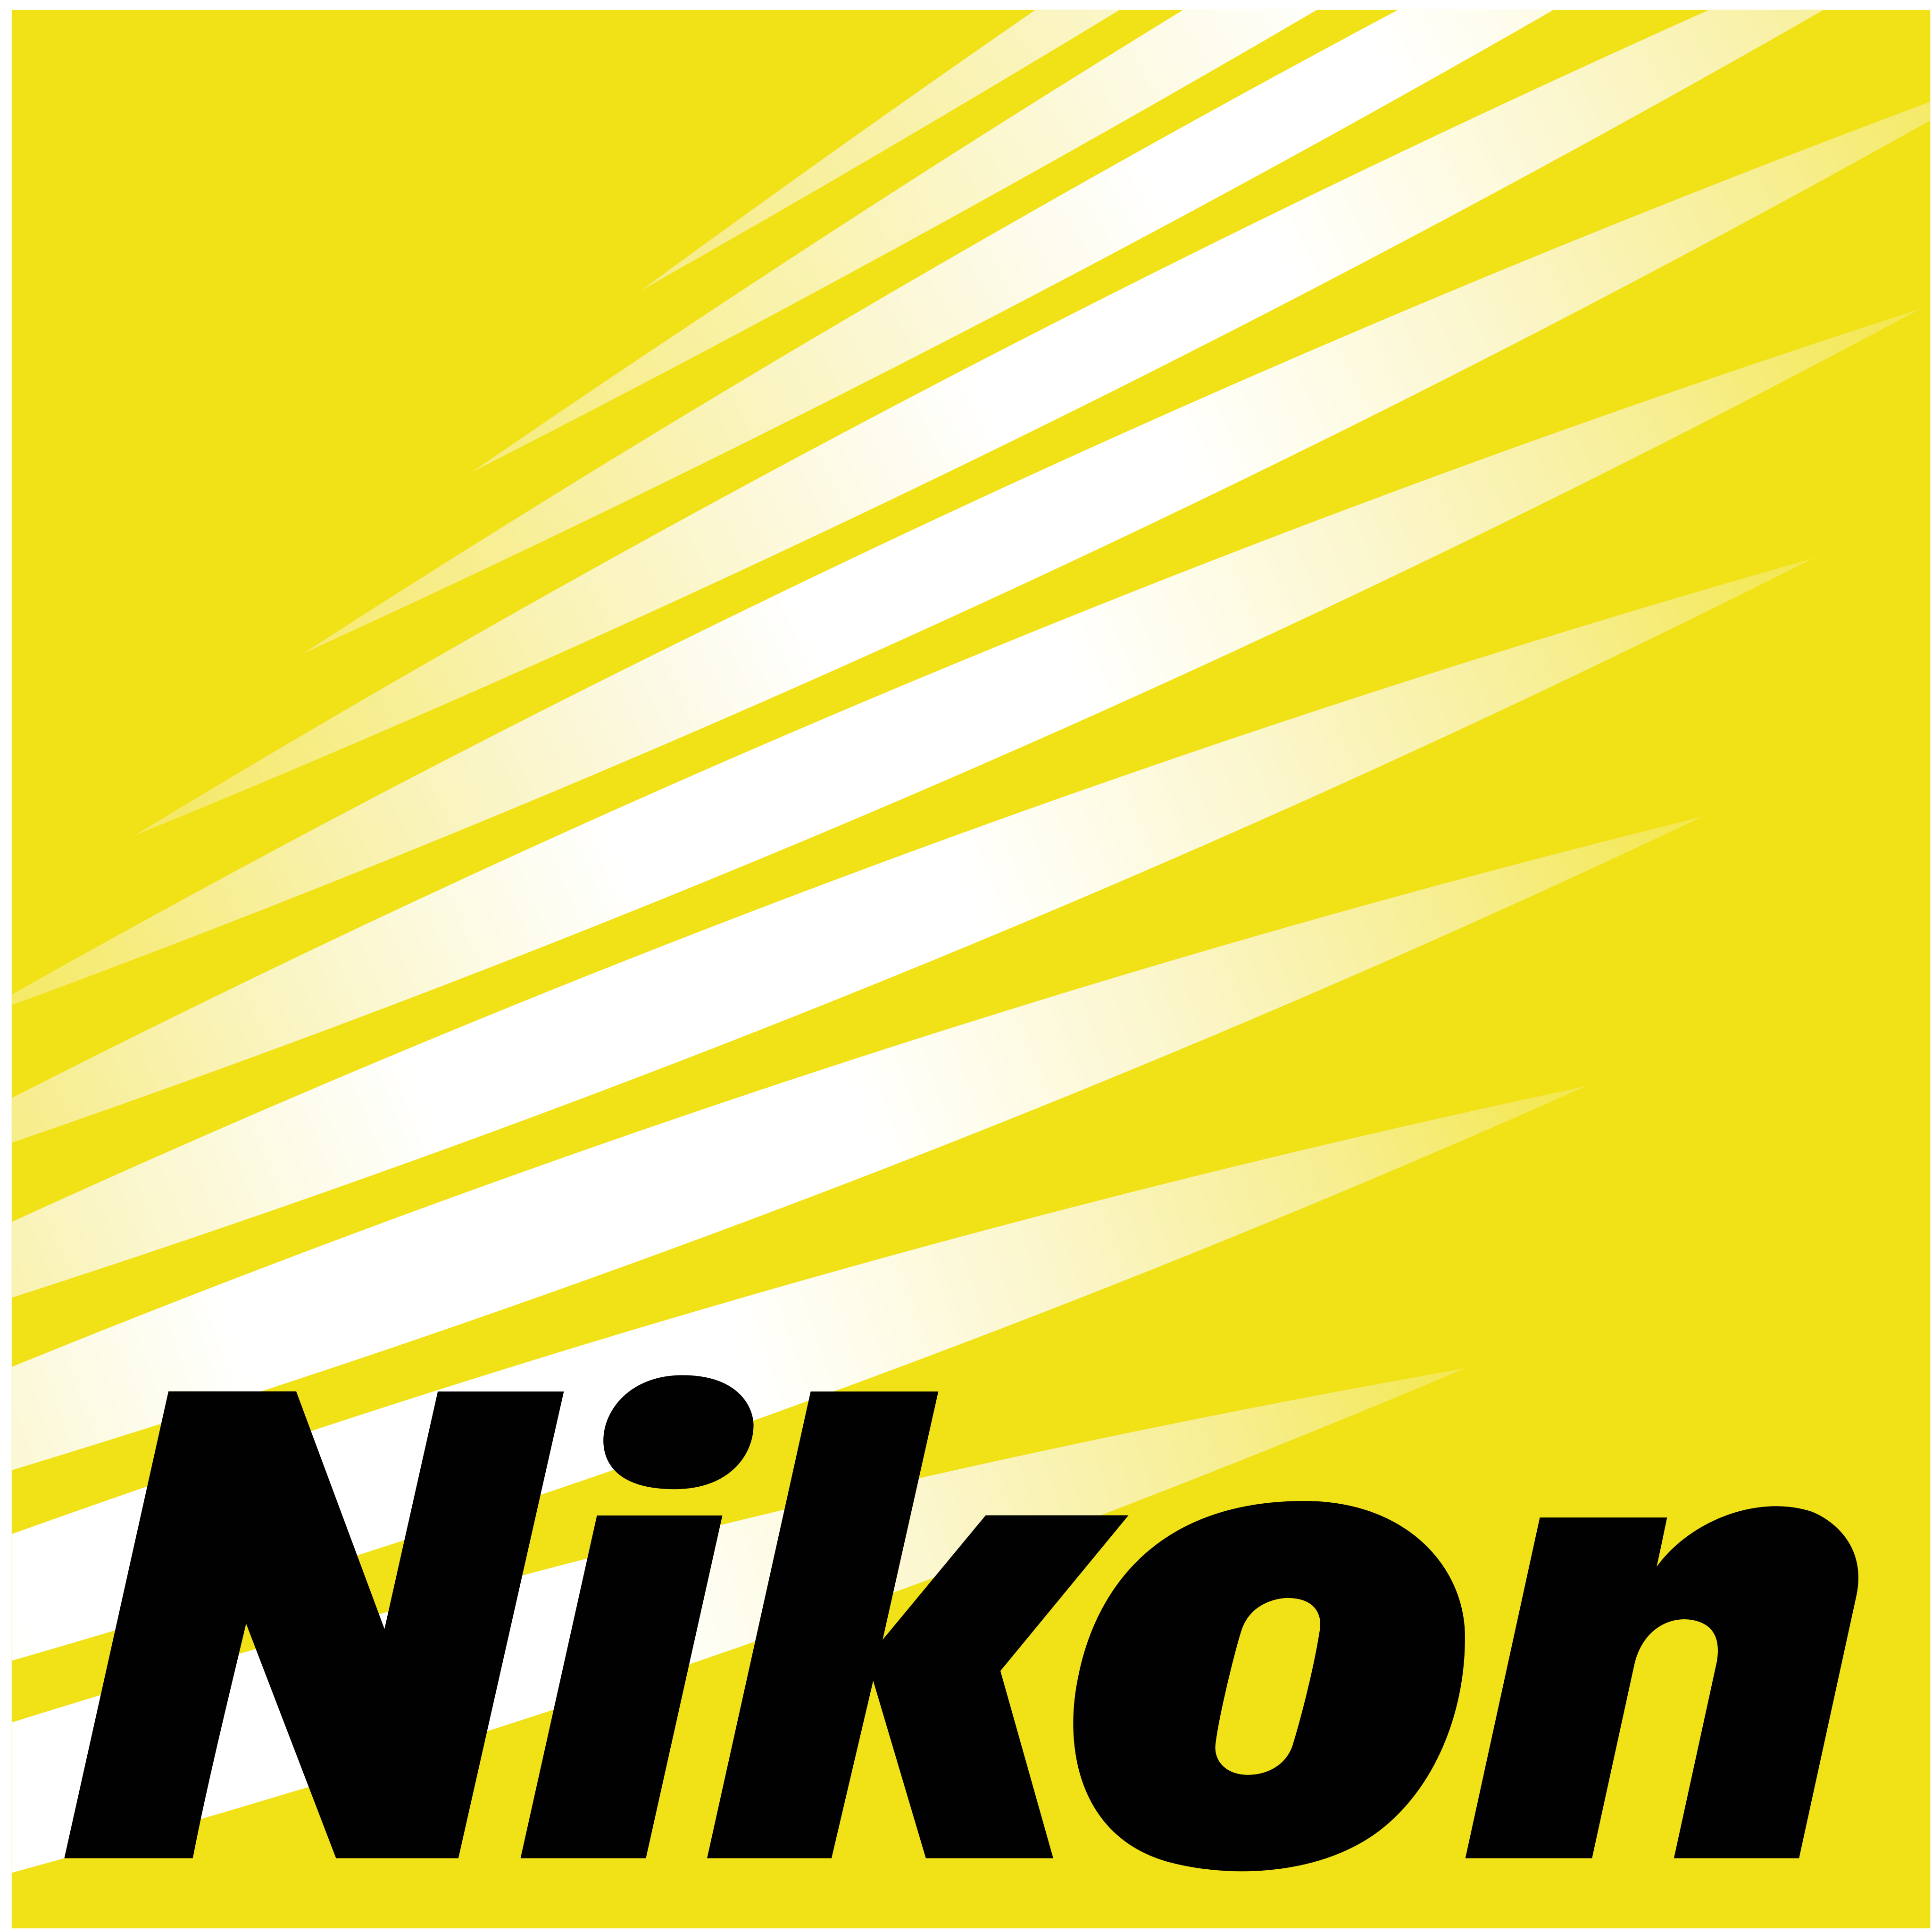 Nikon logo 8 - Nikon Logo